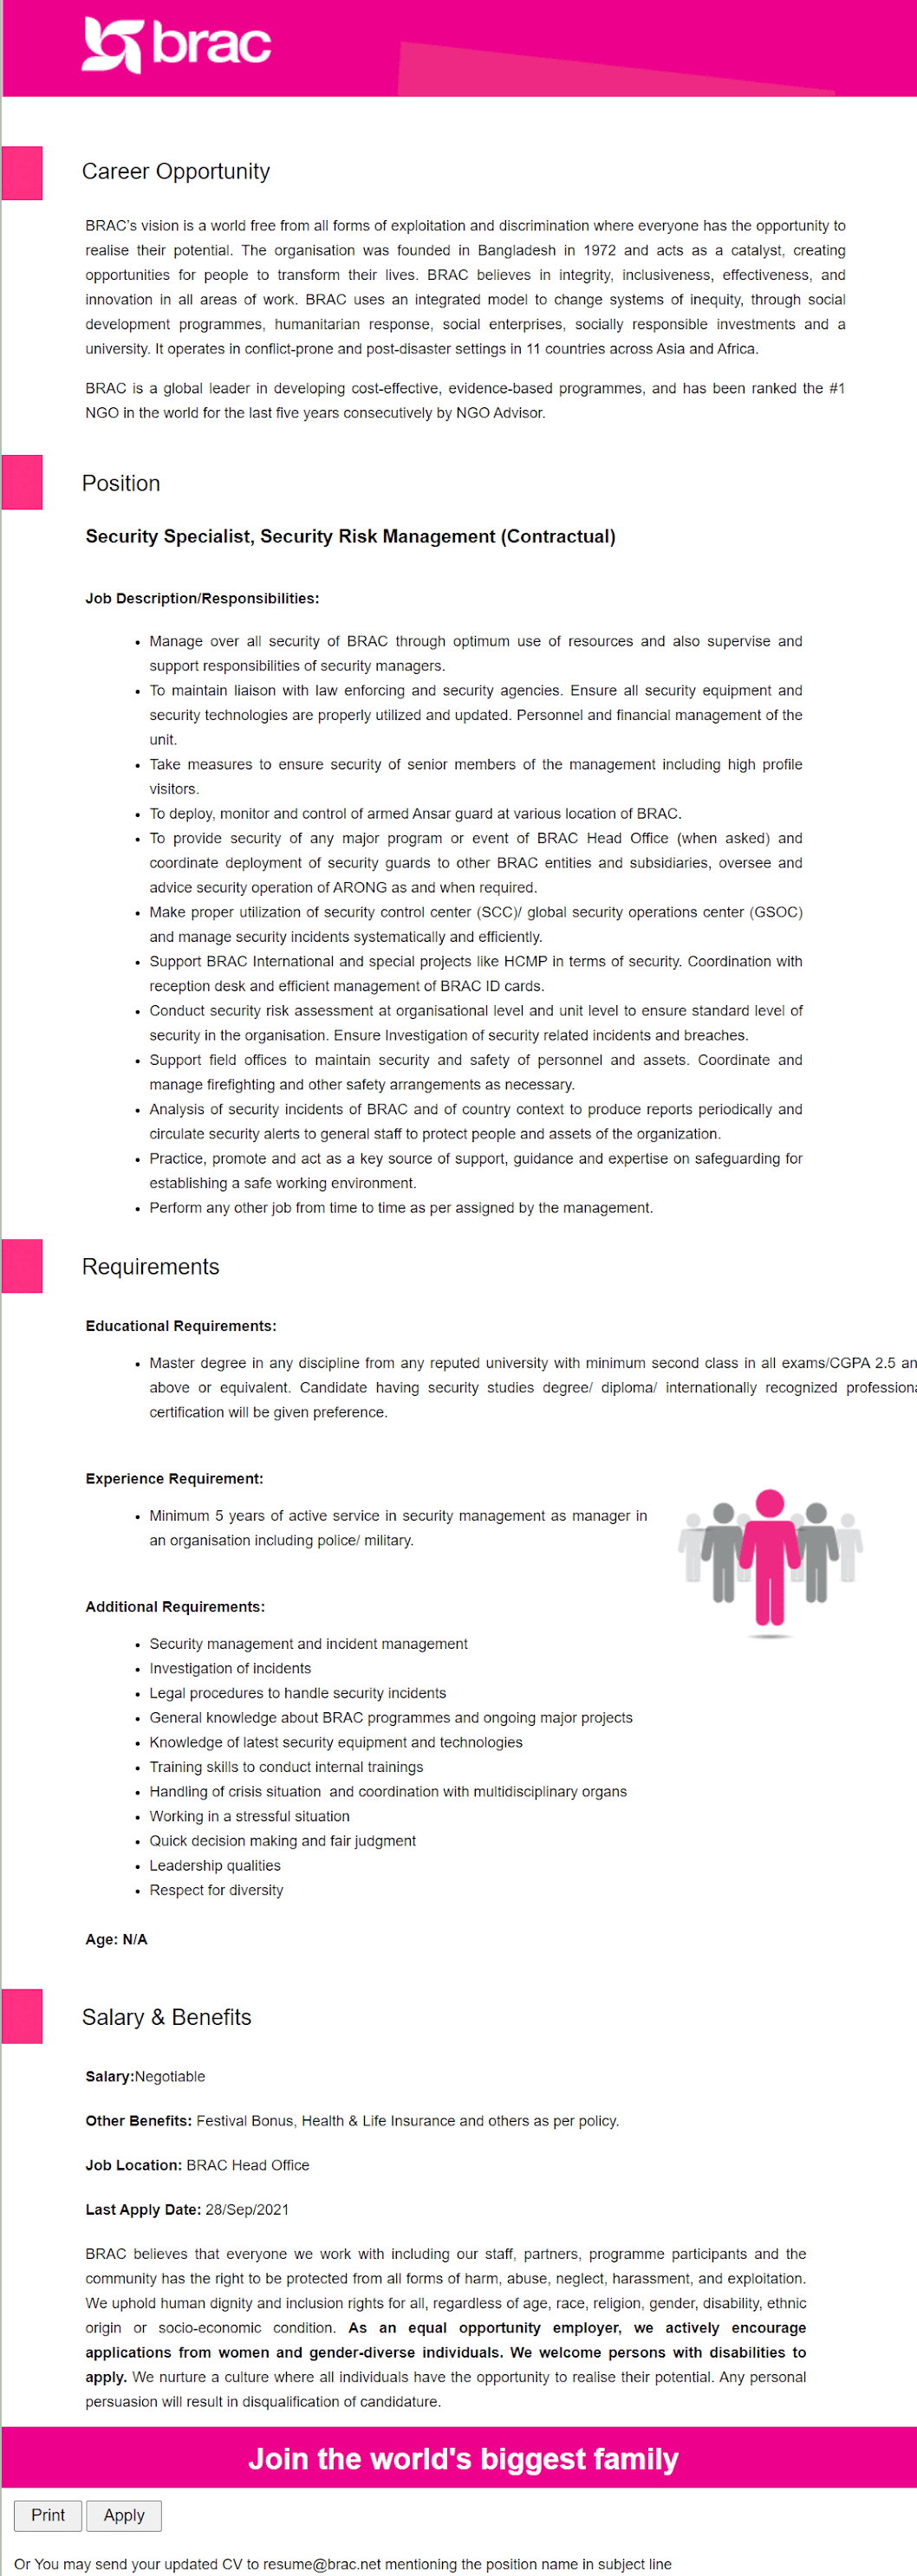 BRAC NGO Job Circular image 2021 Apply